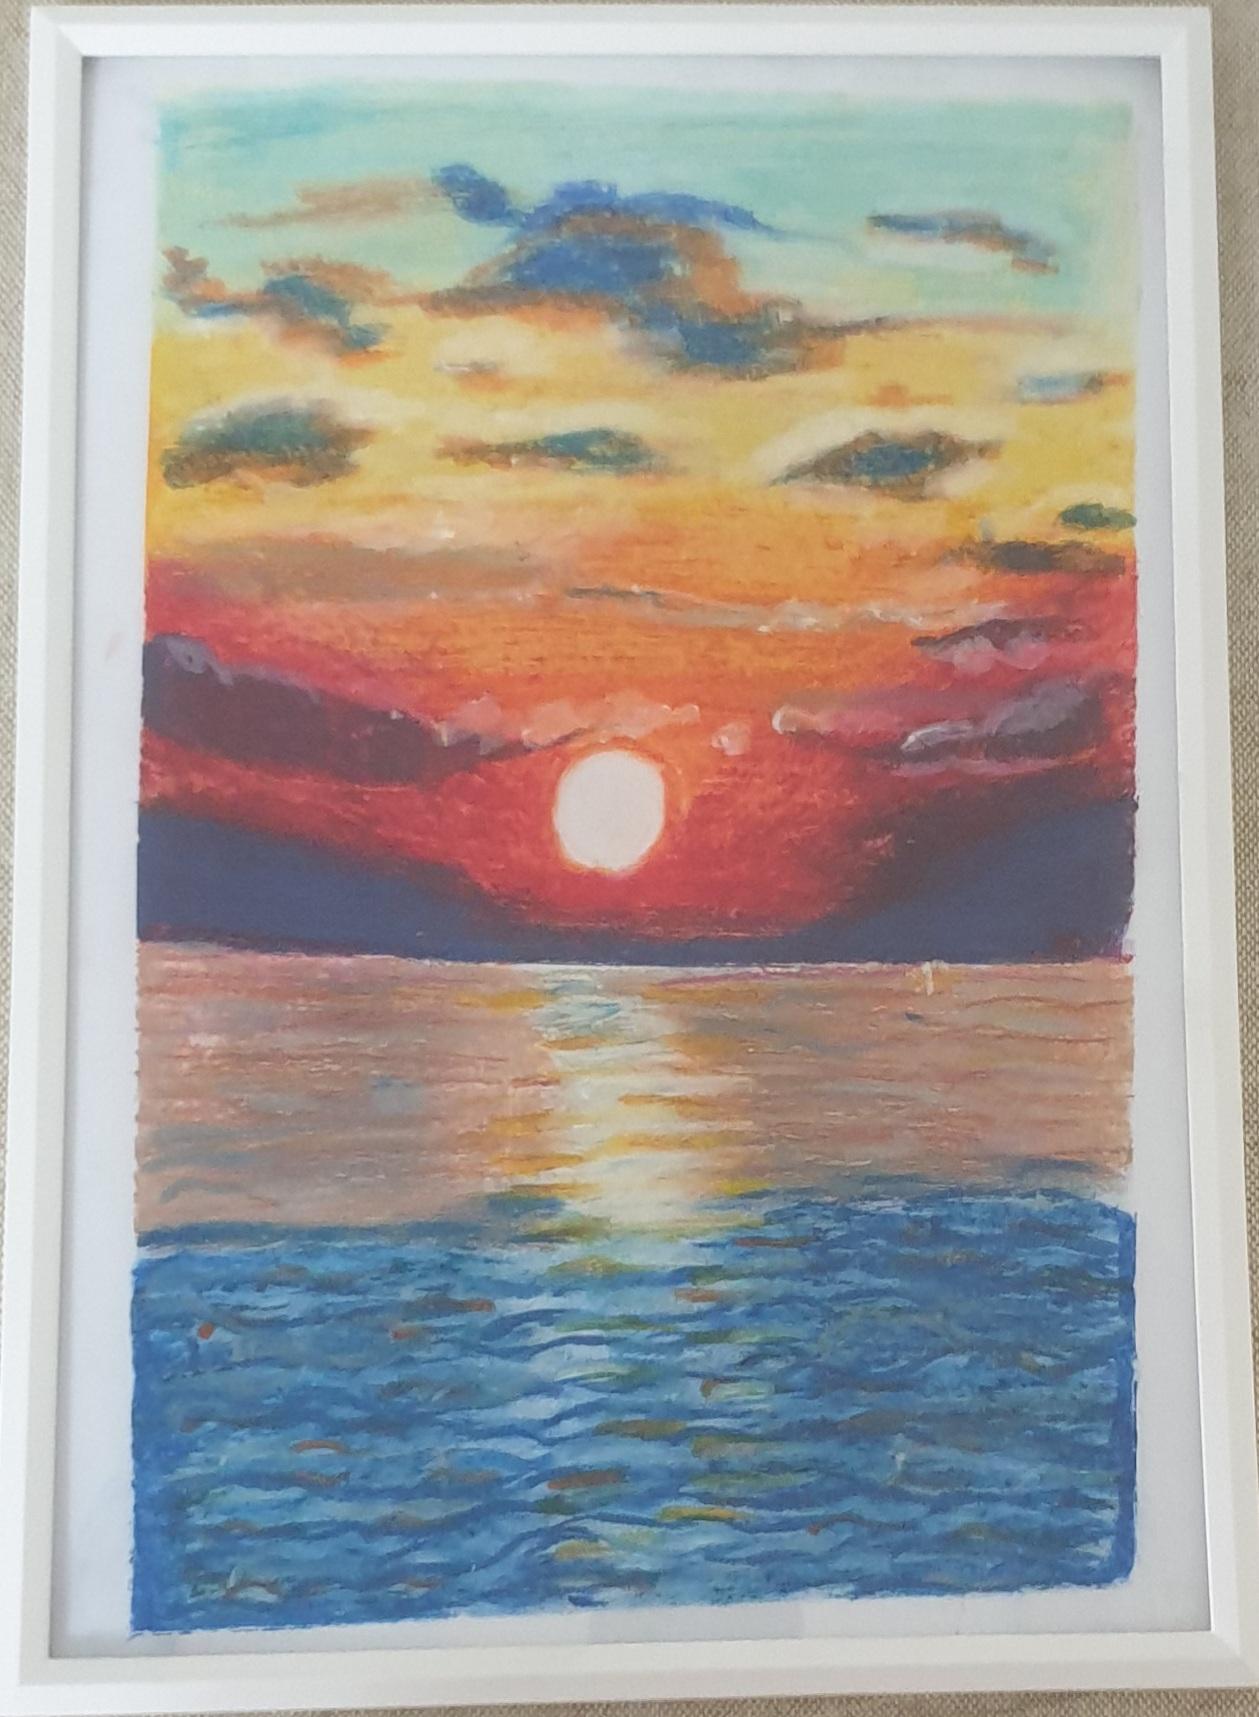 The Sunset of Jumeirah Beach by Resmin Reneesh